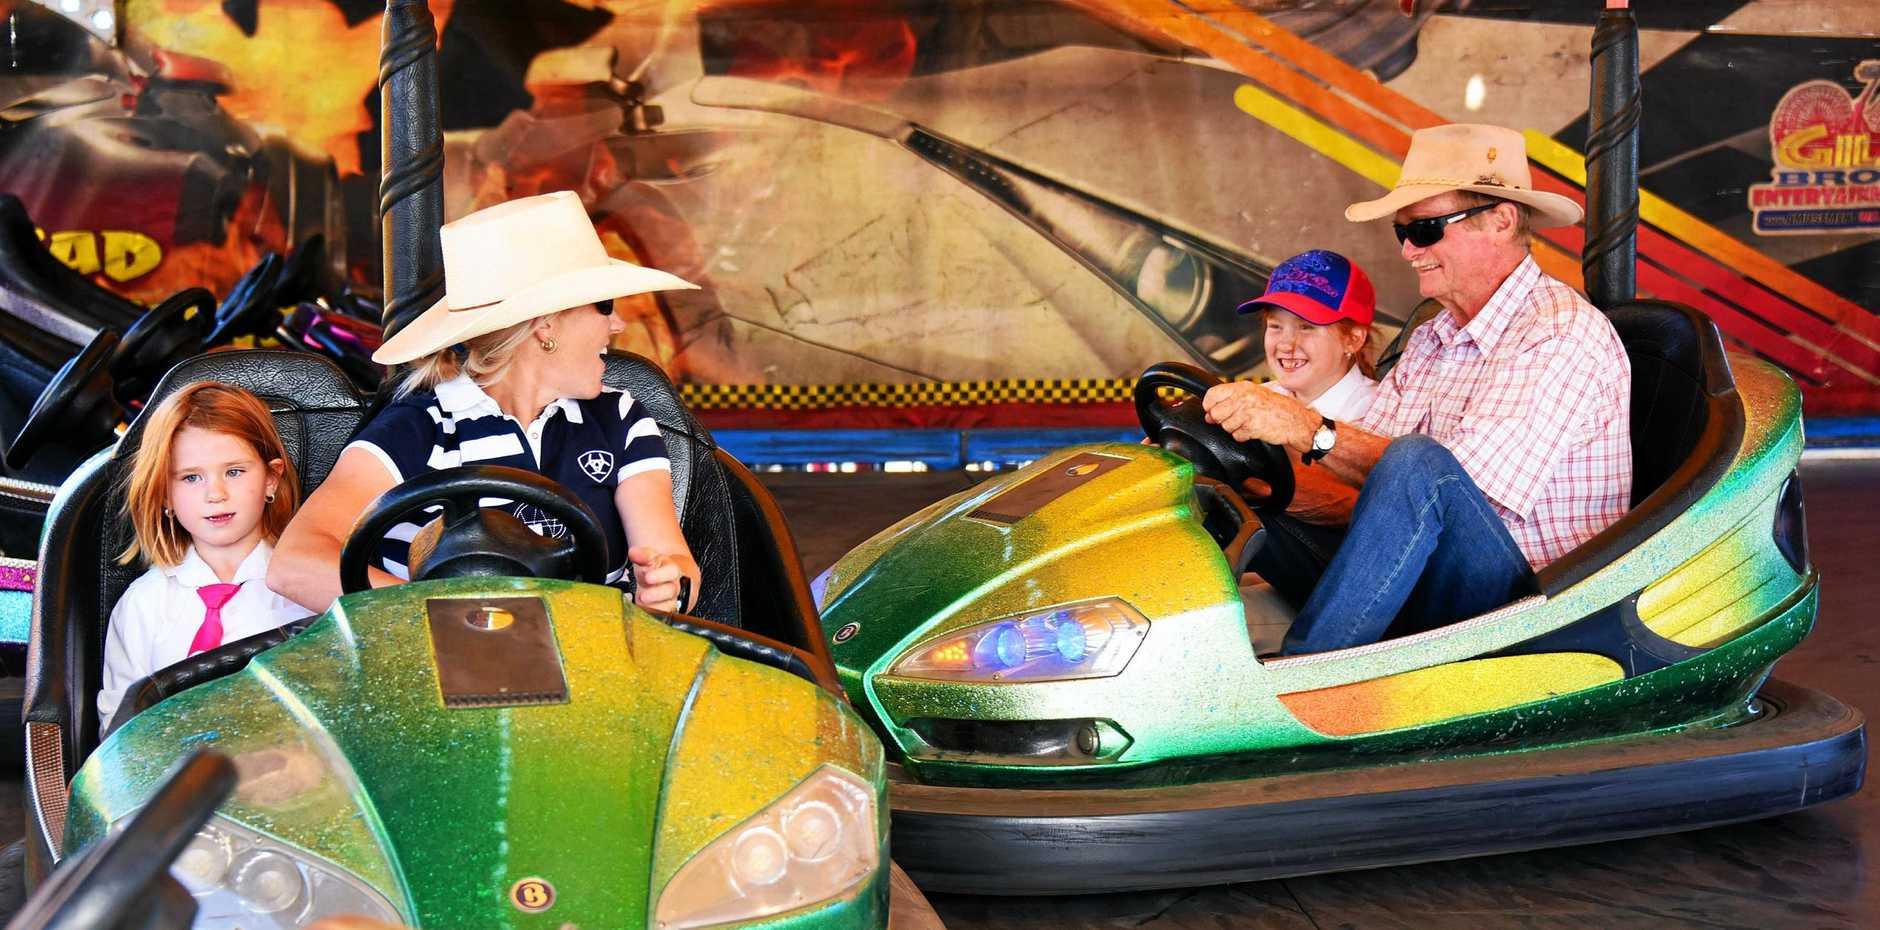 The Harland family enjoy the dodgem cars.